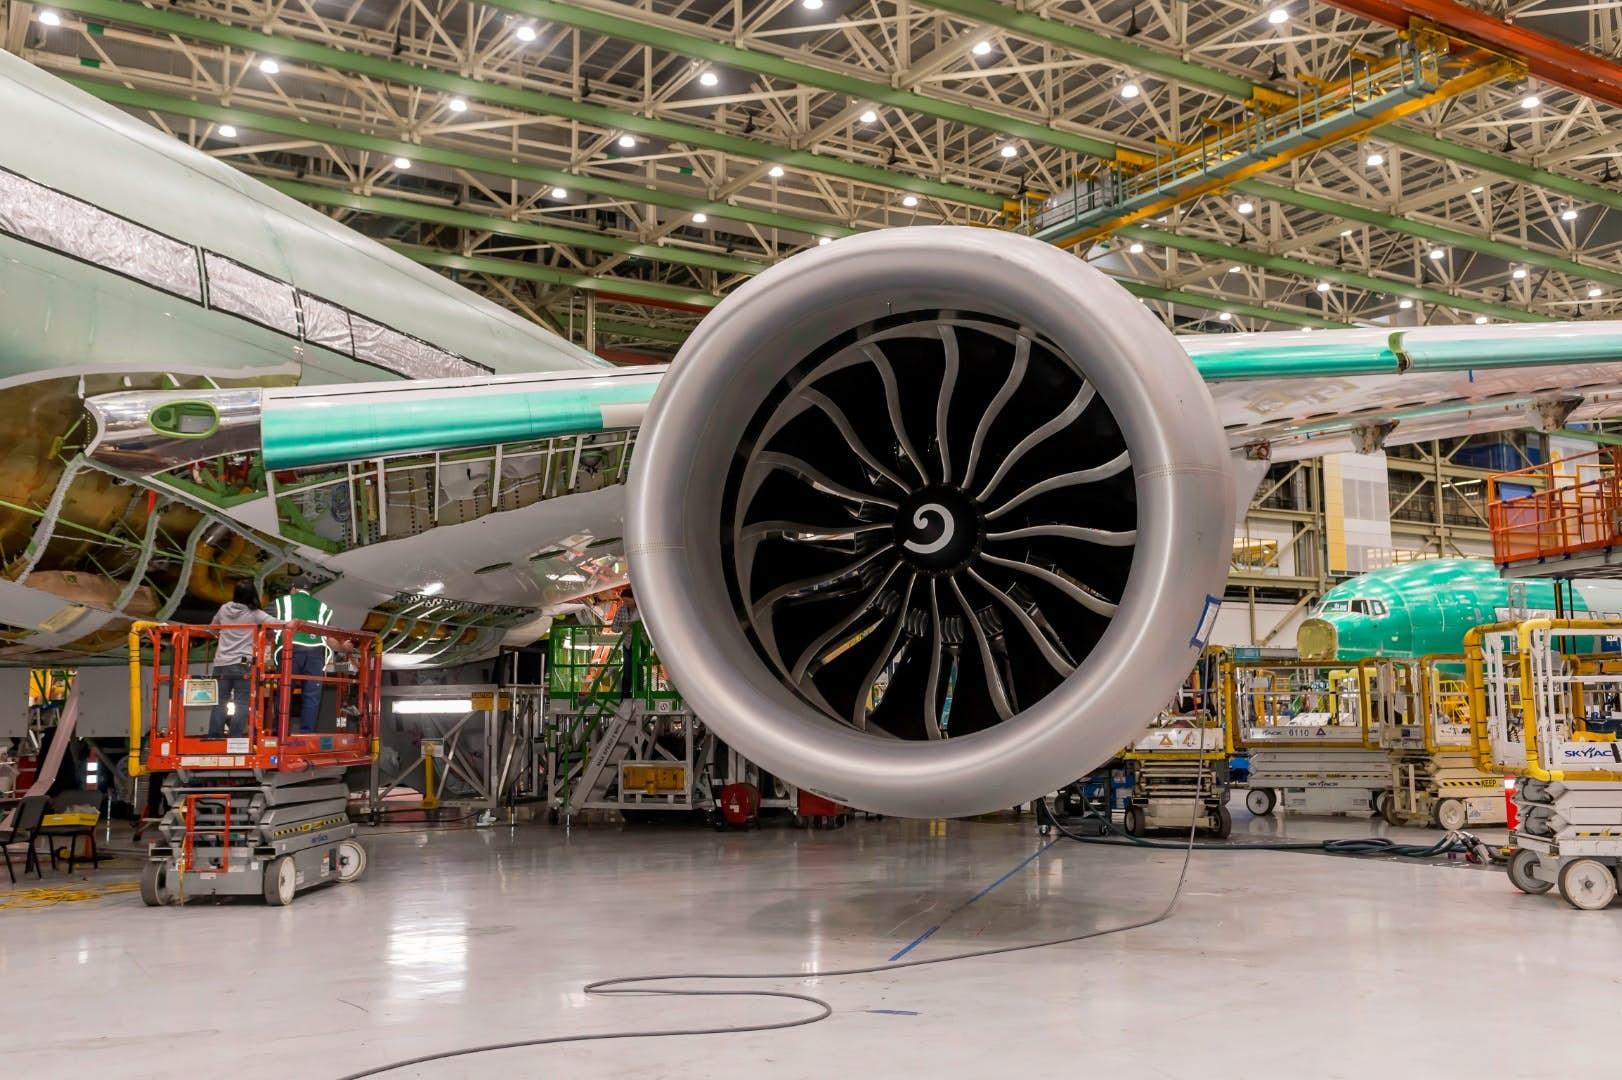 Prototyp 777X smotorem GE9X. Kredit: Boeing.